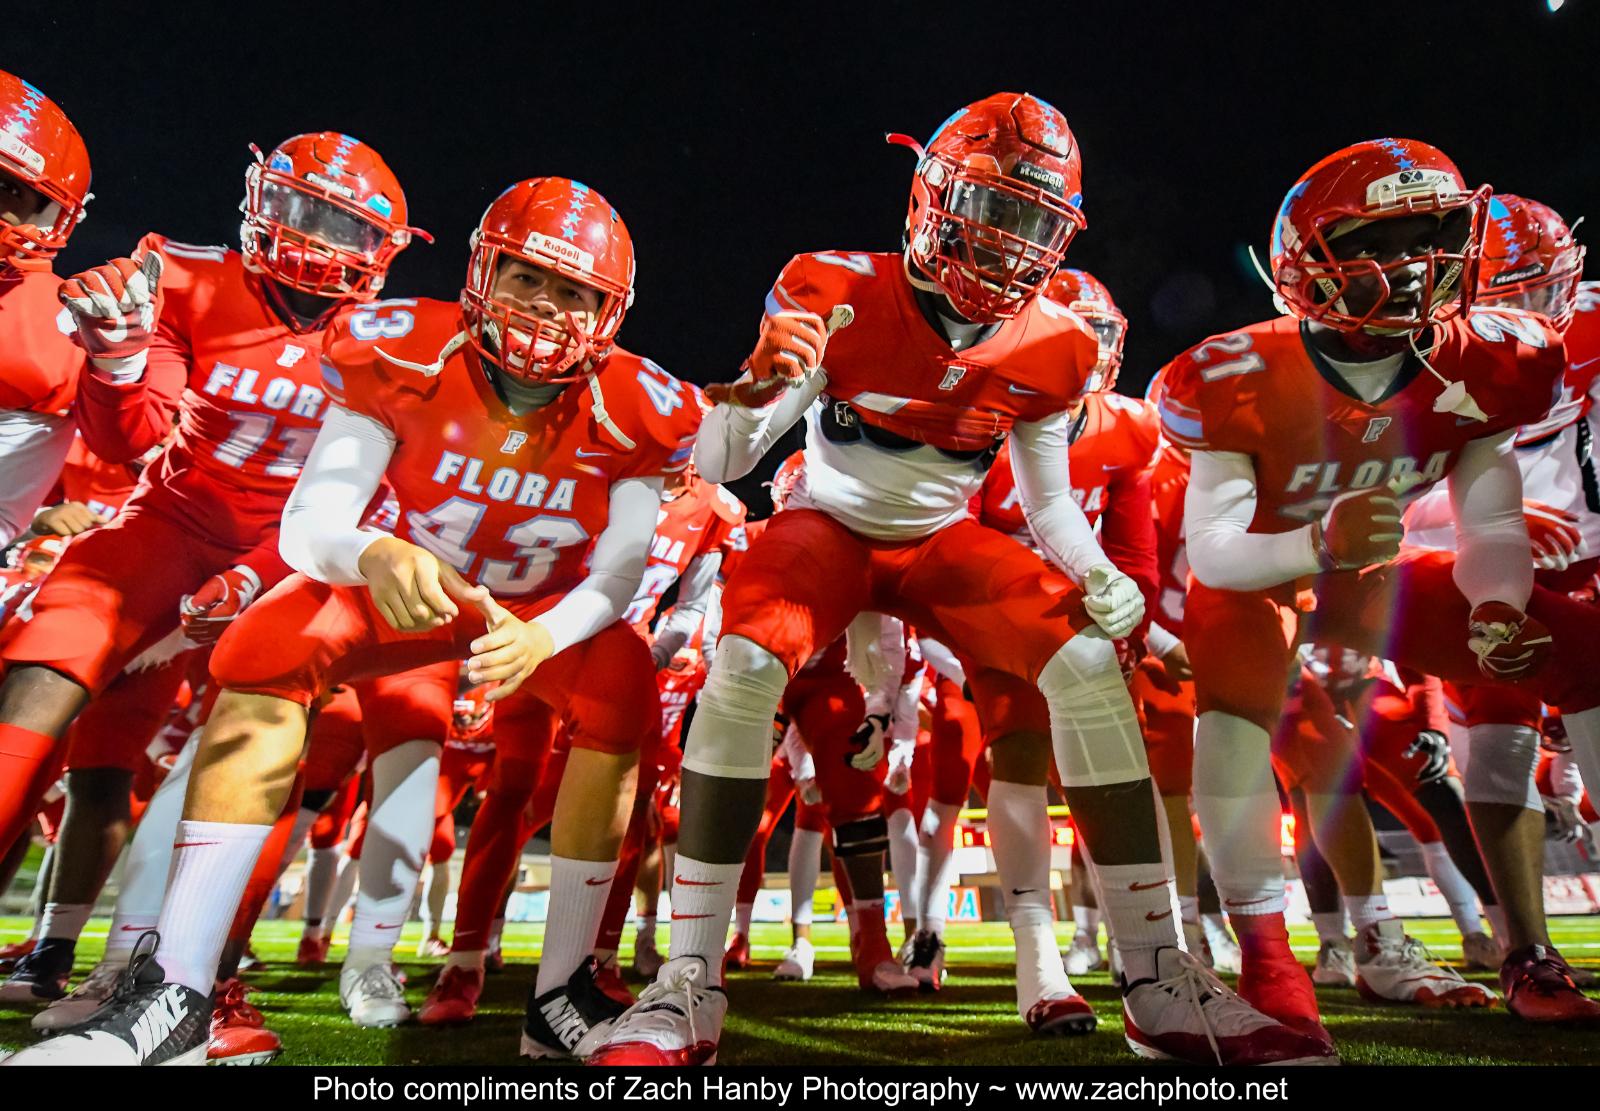 Football Photos: Varsity Football vs Wren – 11/16/18